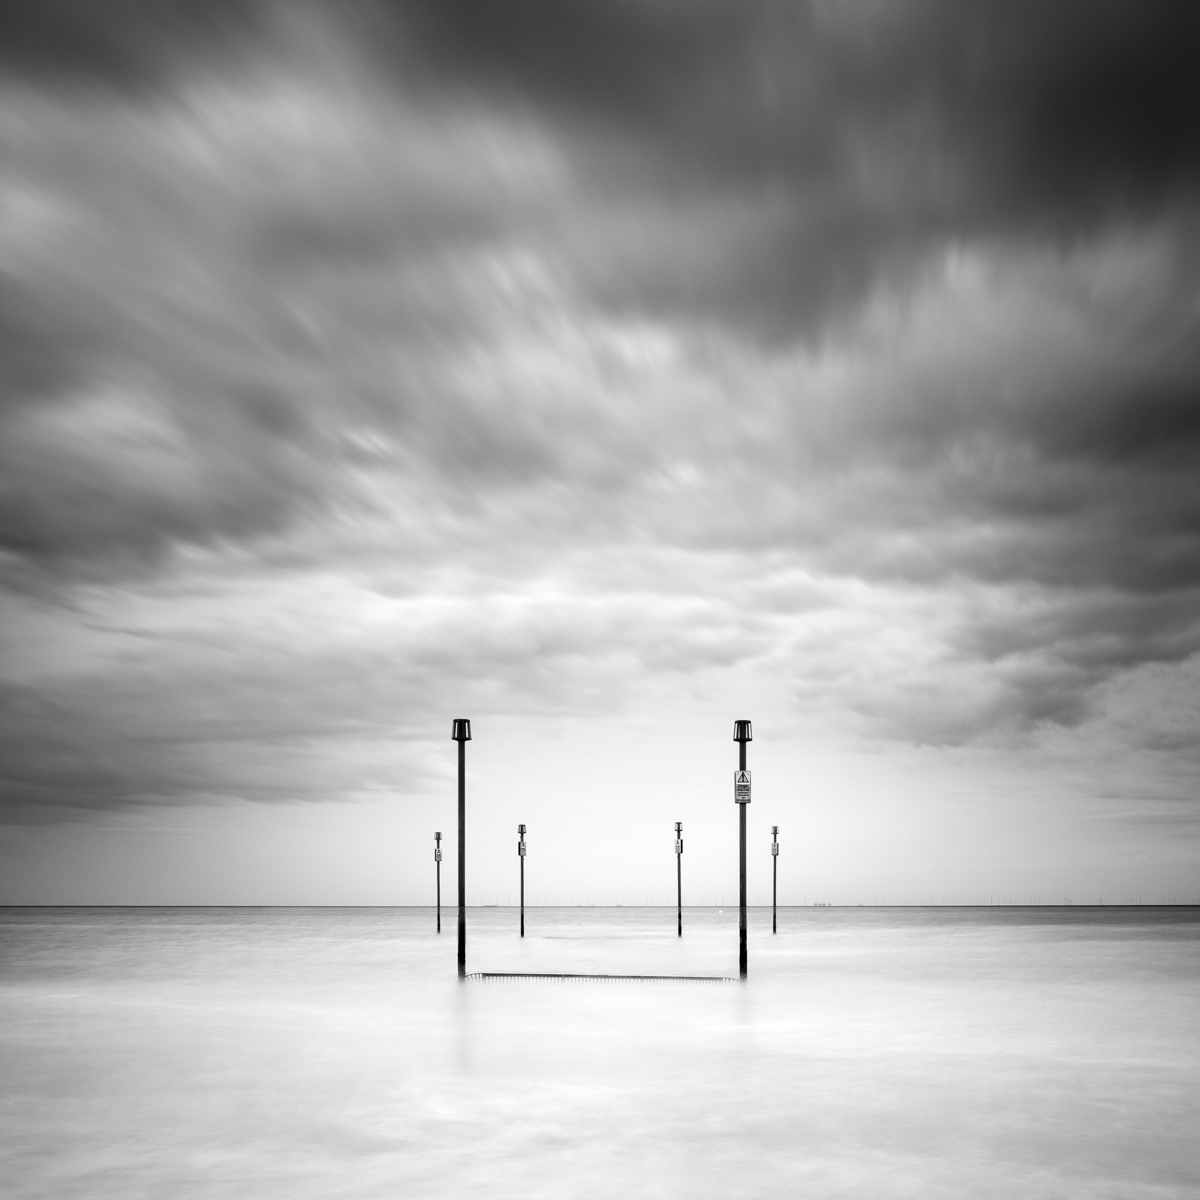 Shoreham, sticks